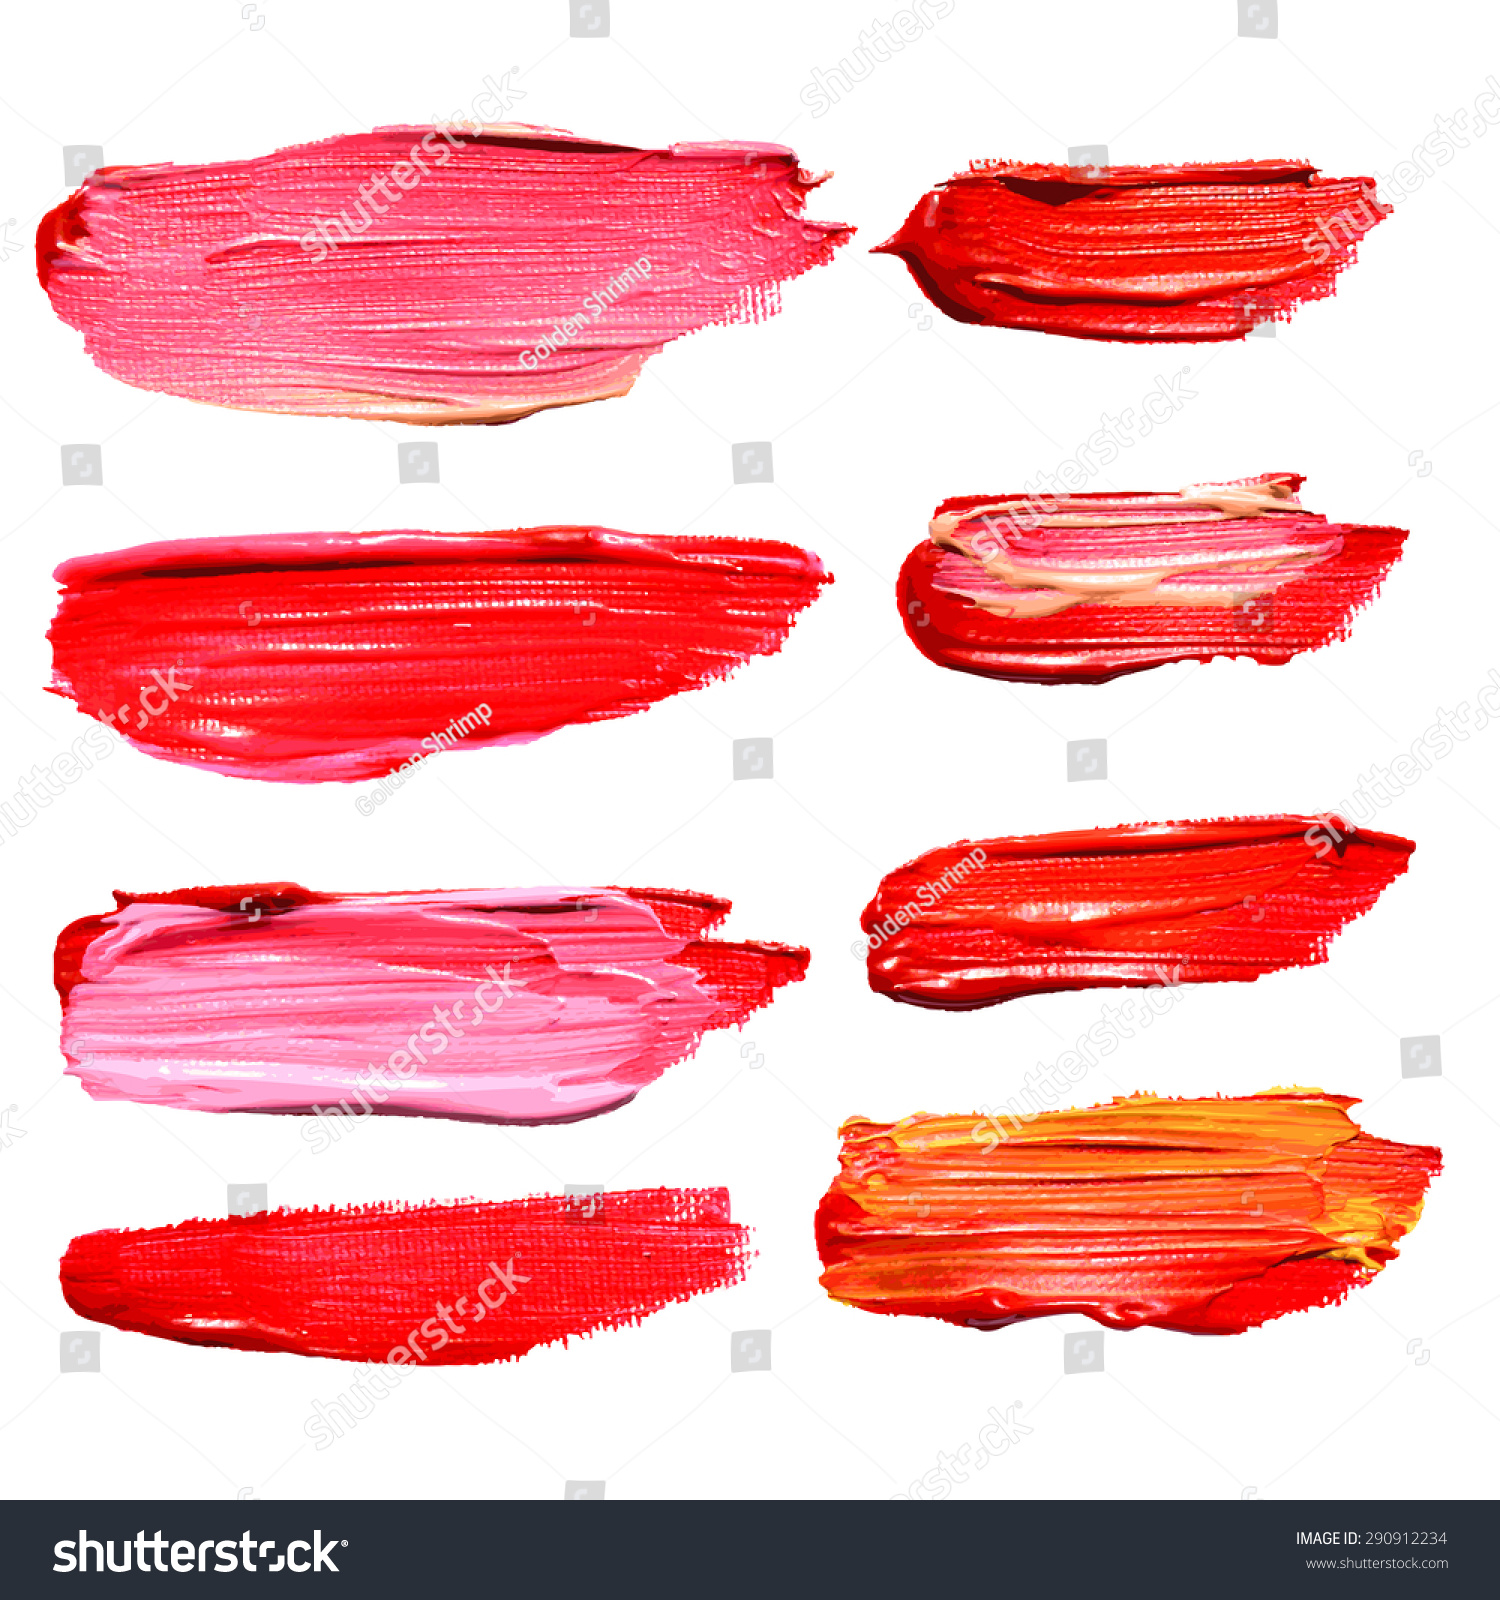 Acrylic Paint Brush Illustrator